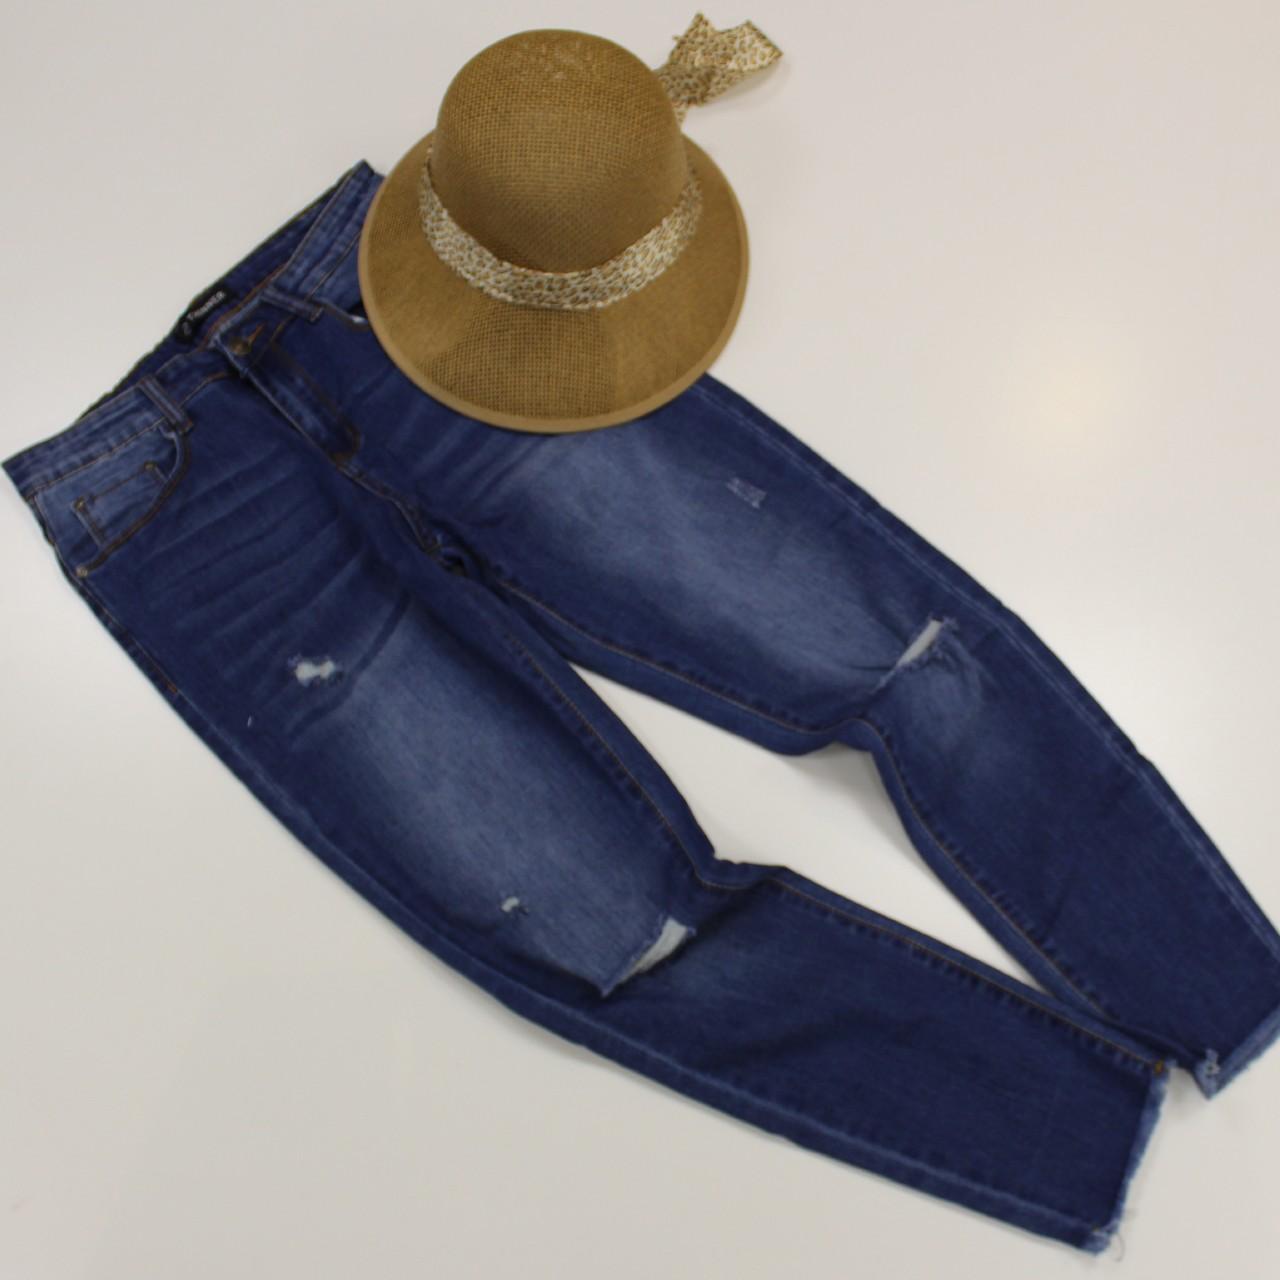 ג'ינס קרעים נשים